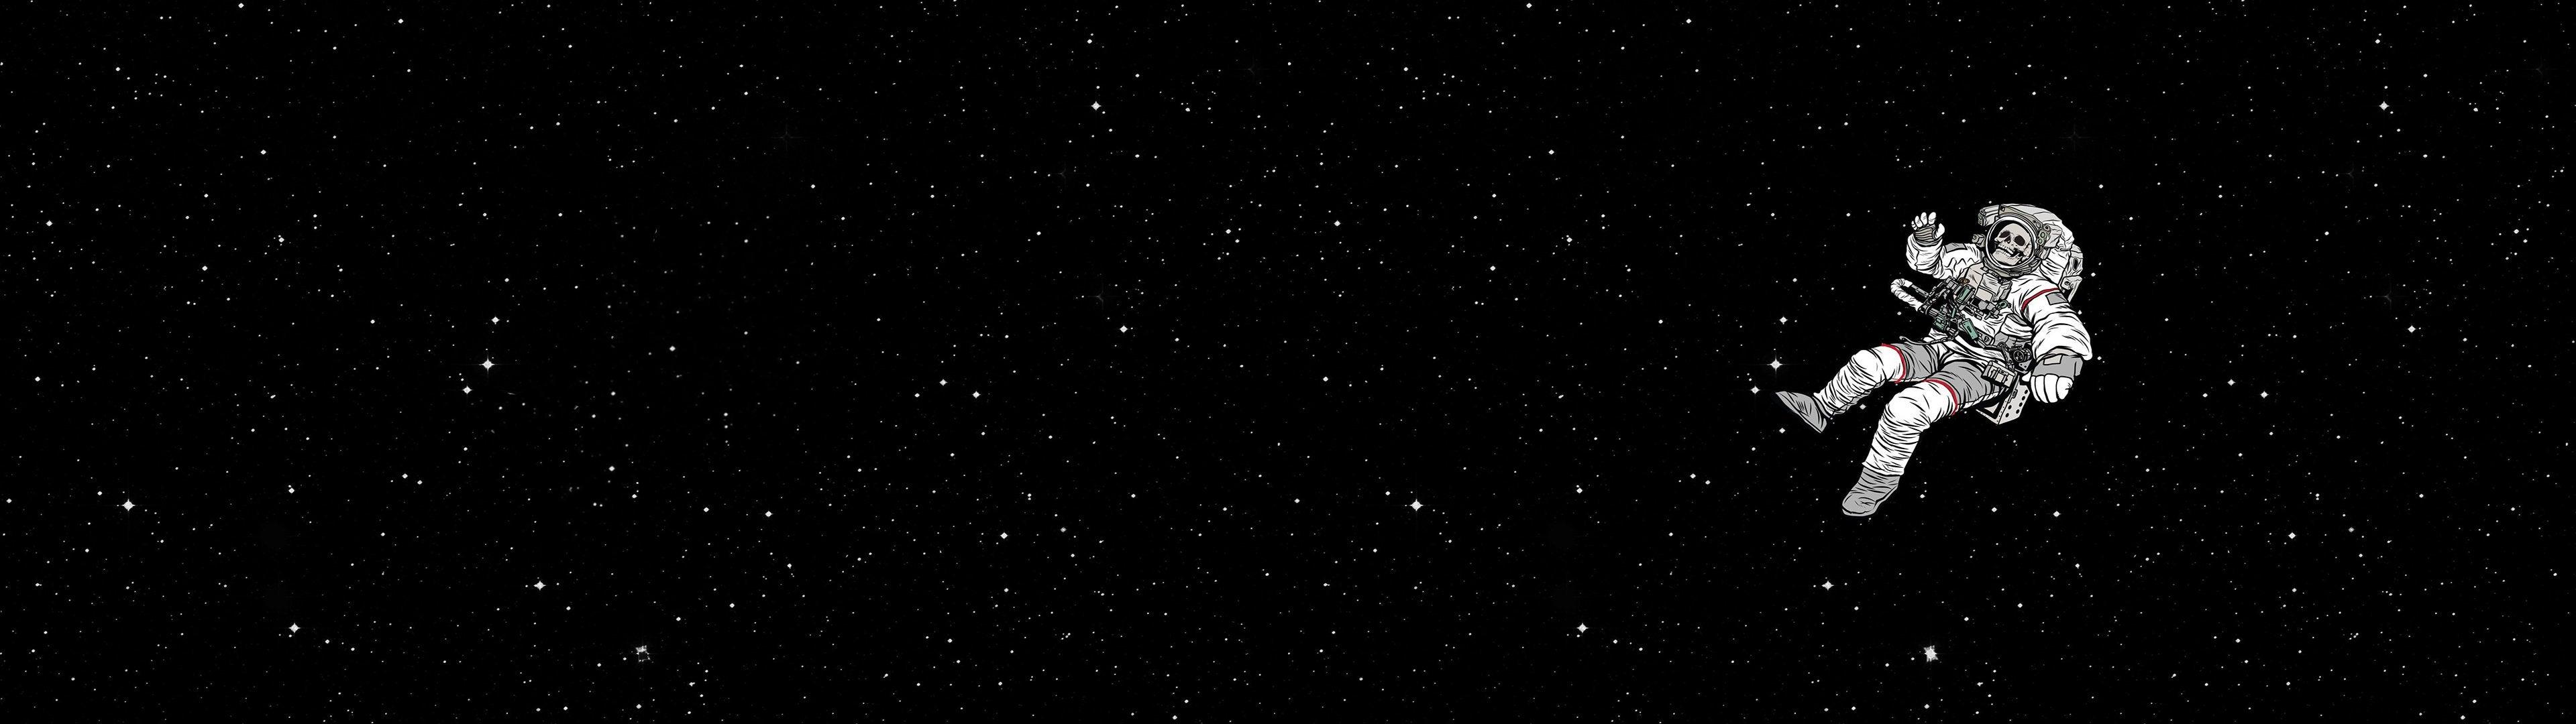 Wallpaper Space Astronaut Skull Stars 3840x1080 00stoyita00 1854245 Hd Wallpapers Wallhere